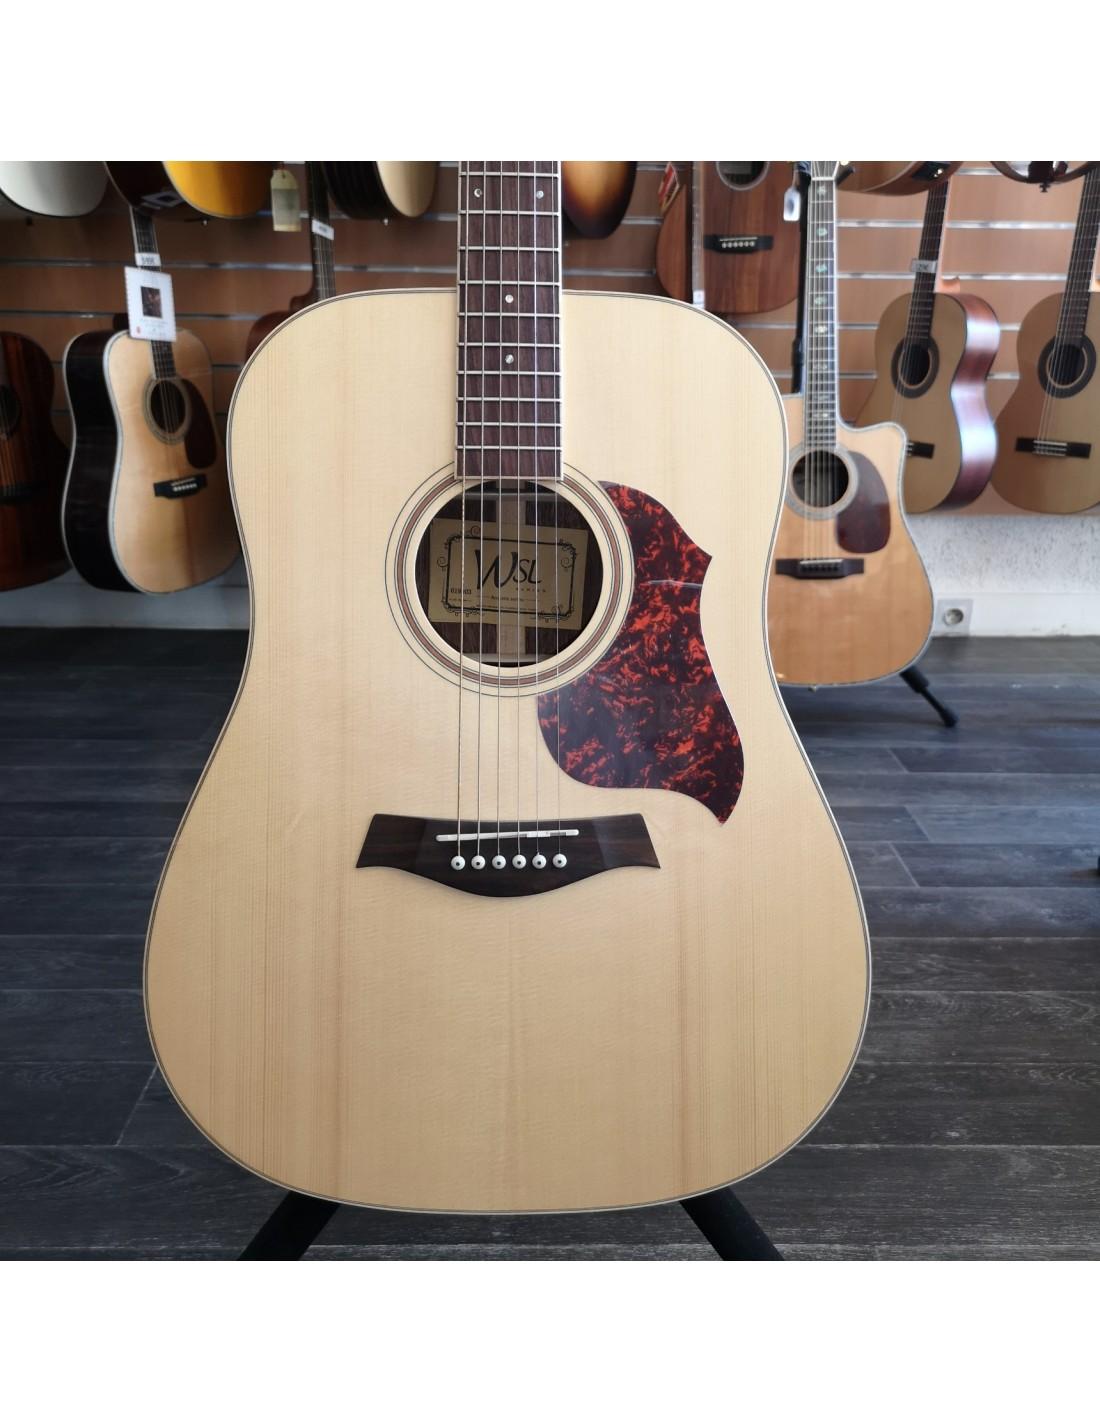 Fender Telecaster Signature Johnny Hallyday Deal Music